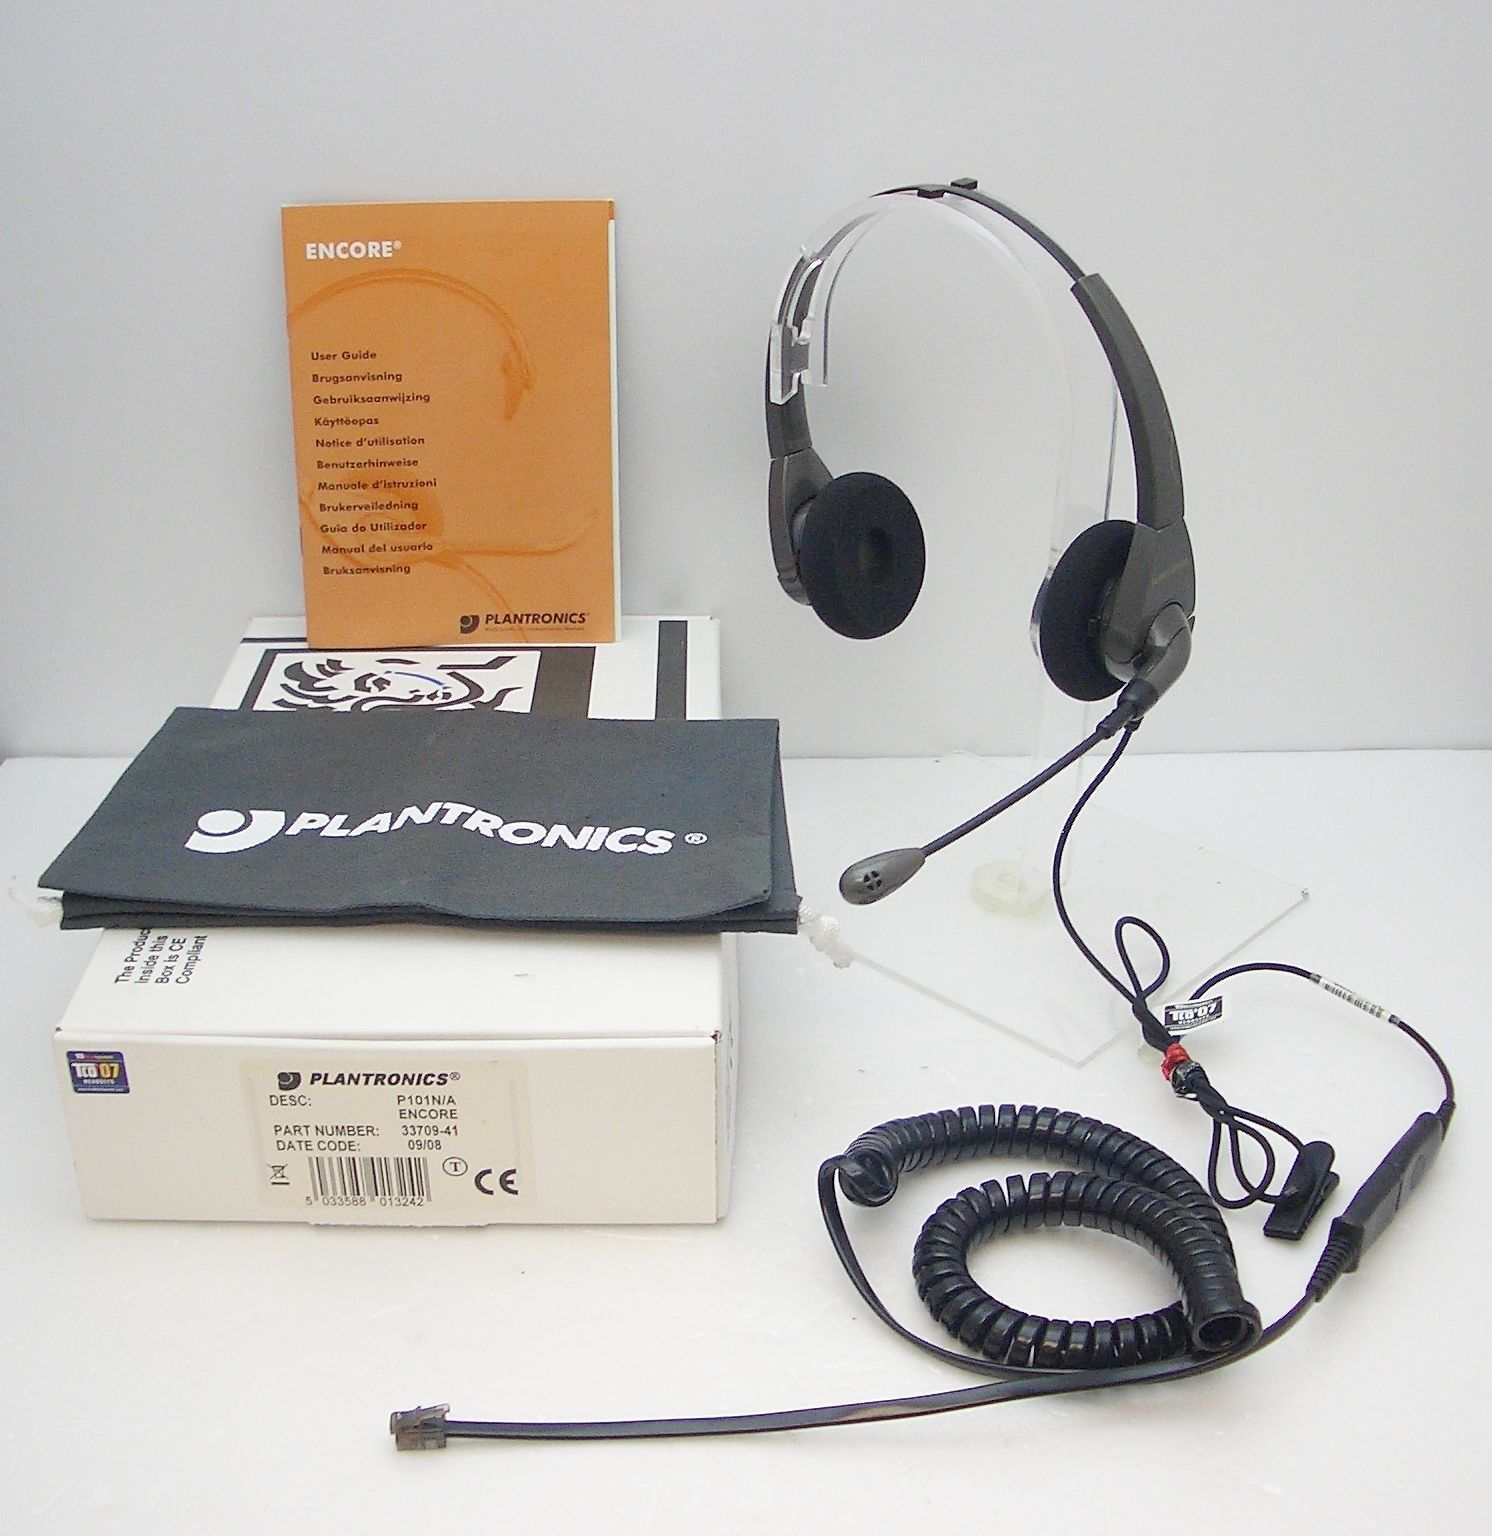 Plantronics P51N-U10P NC Headset for Avaya Aastra Nortel Polycom Toshiba Mitel